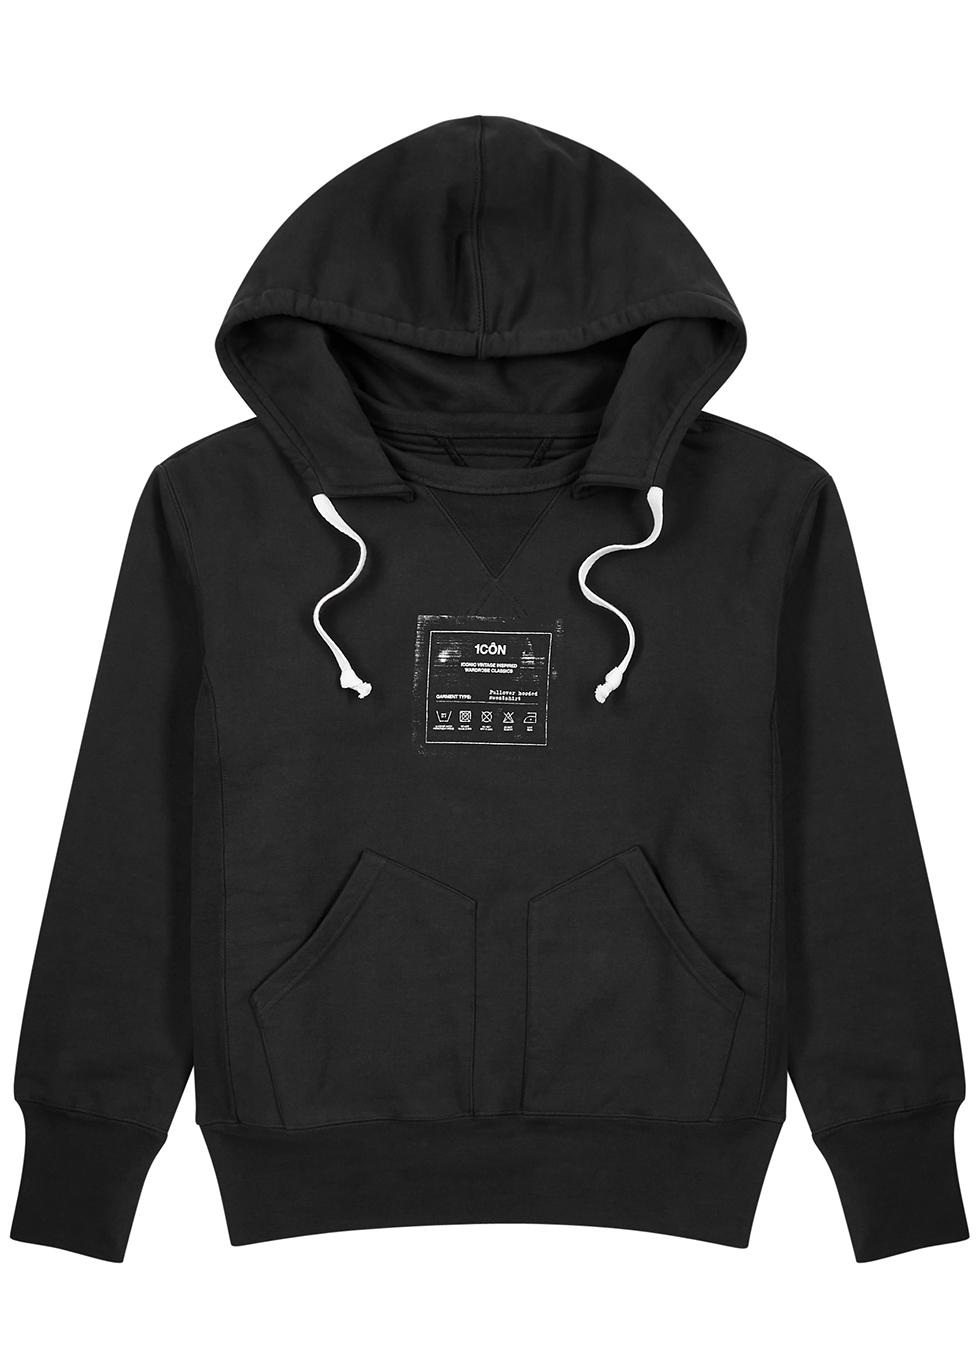 Dark grey hooded cotton sweatshirt